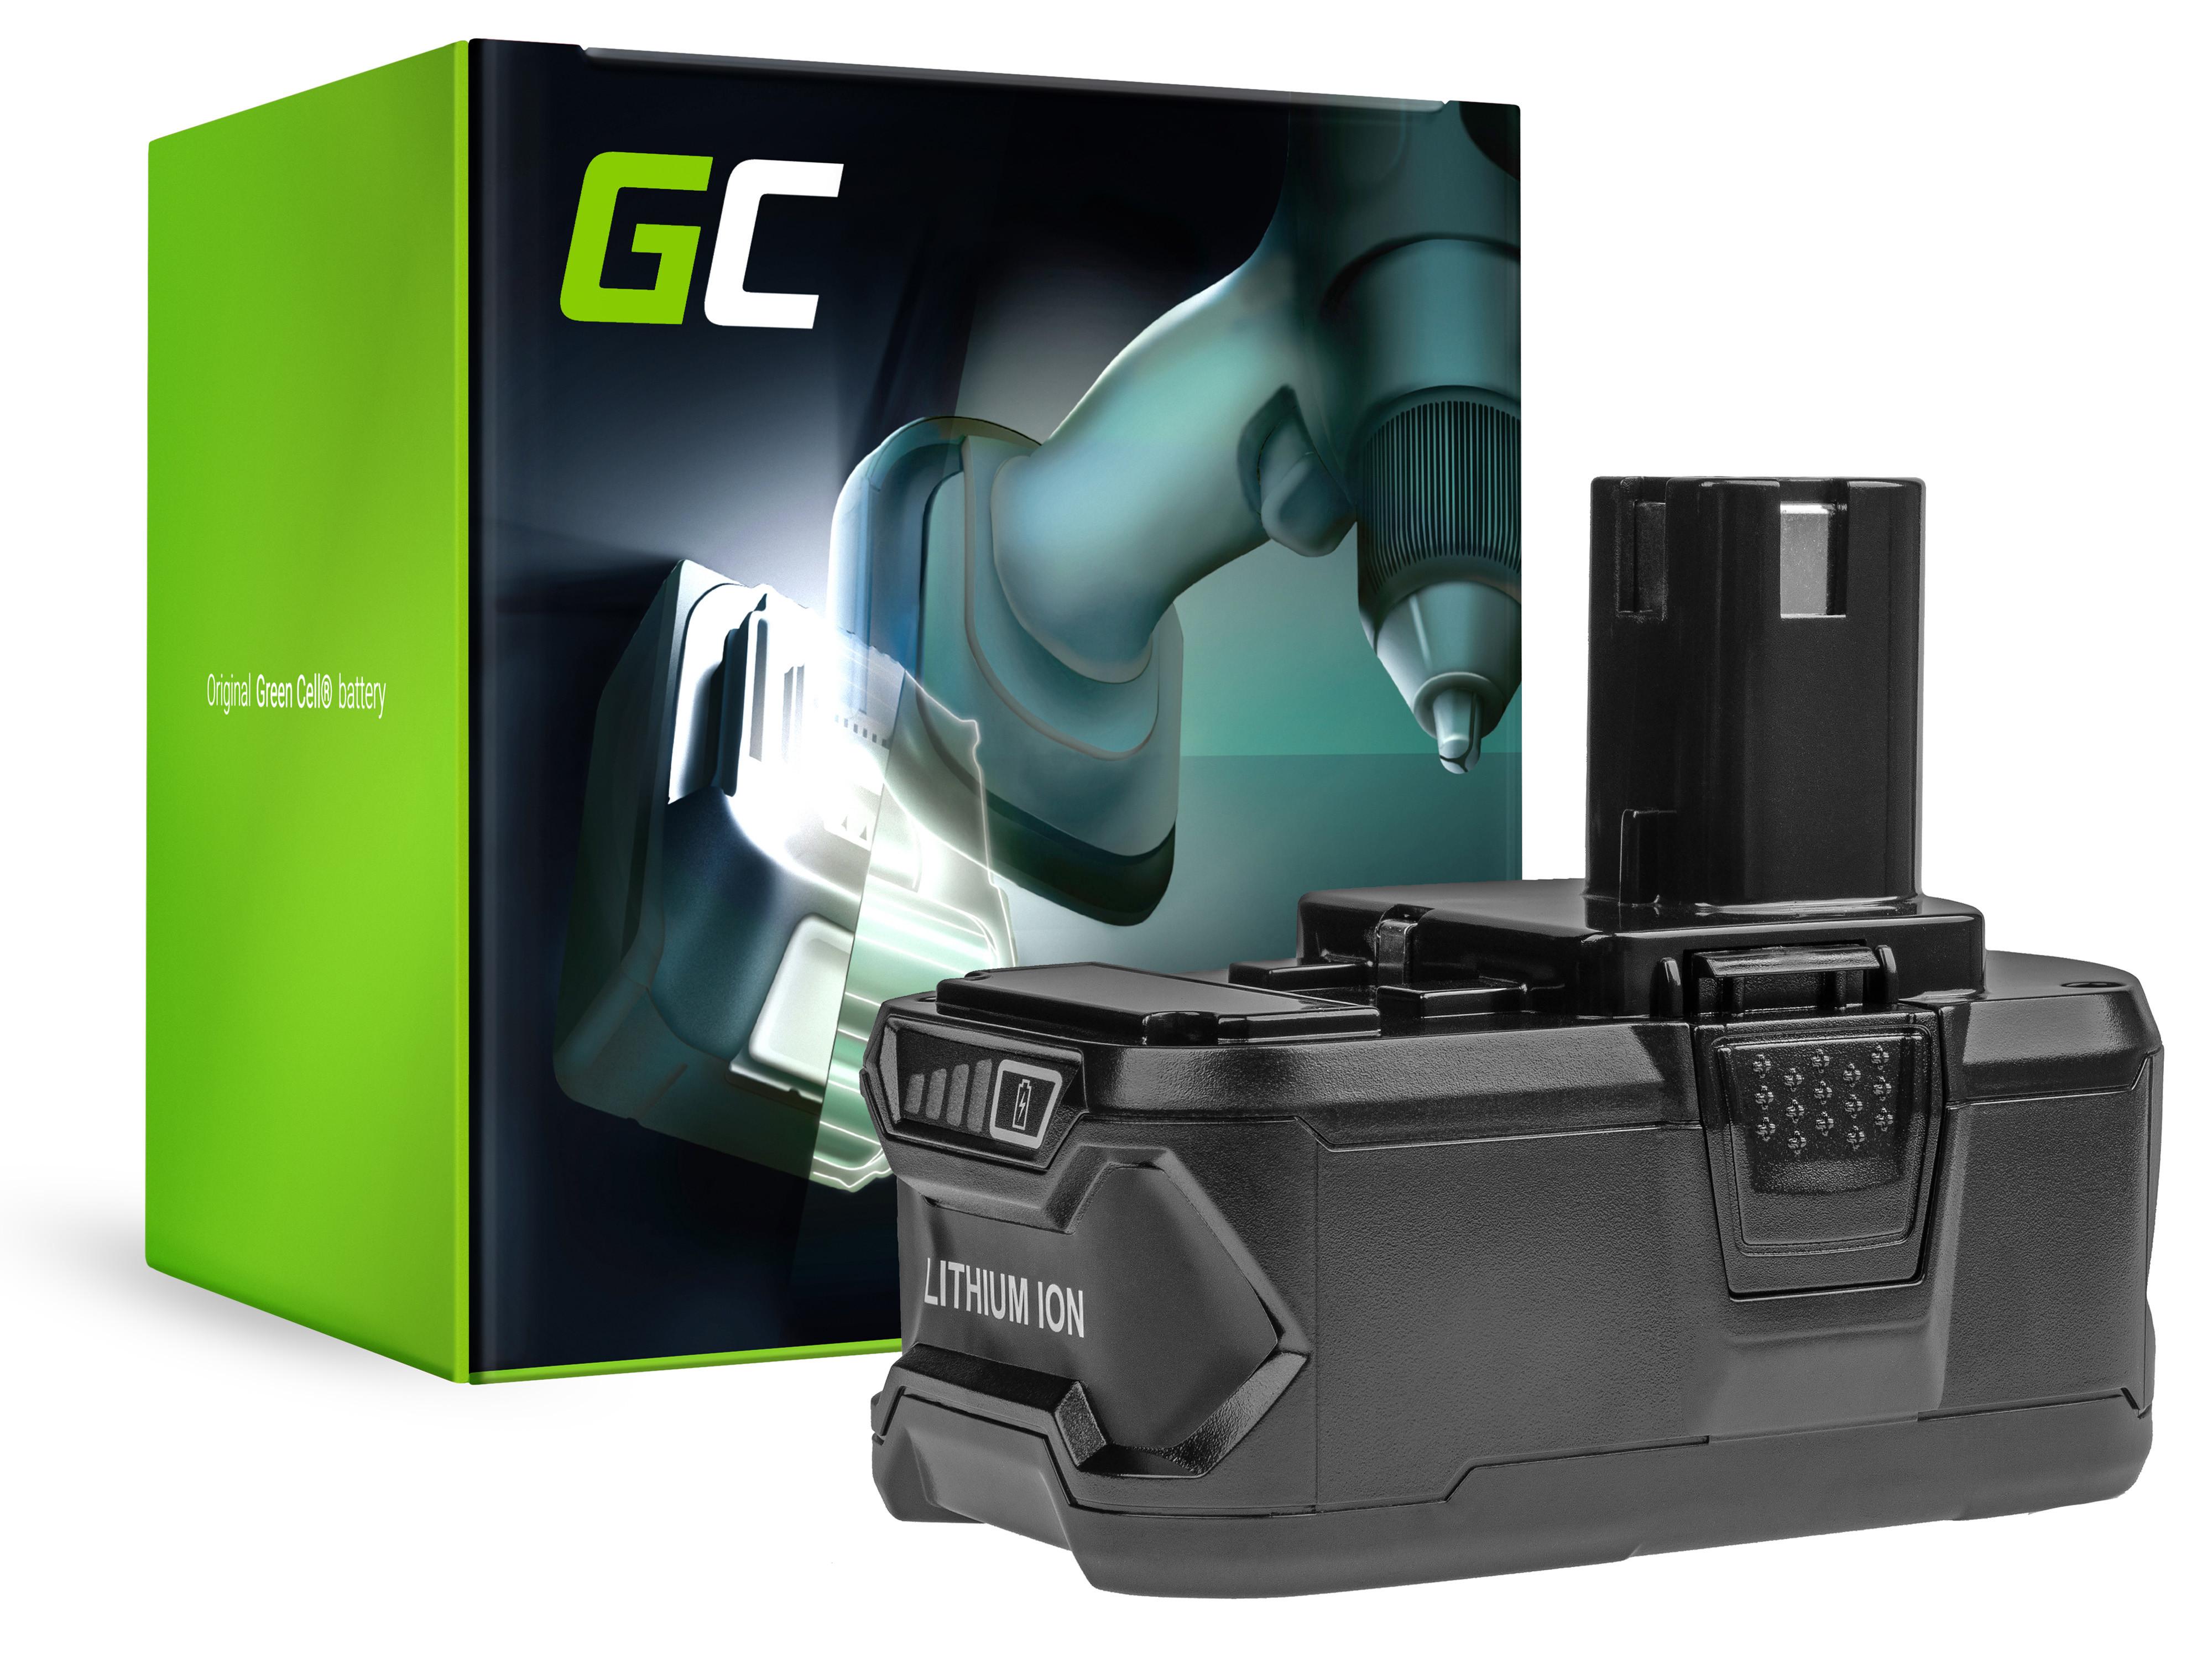 Green Cell PT62 Baterie Ryobi ONE+ P108 RB18L13 RB18L15 RB18L20 RB18L25 RB18L50, RYOBI BCL14181H R18DD3 R18IW3 R18IW3-0 5000mAh Li-ion